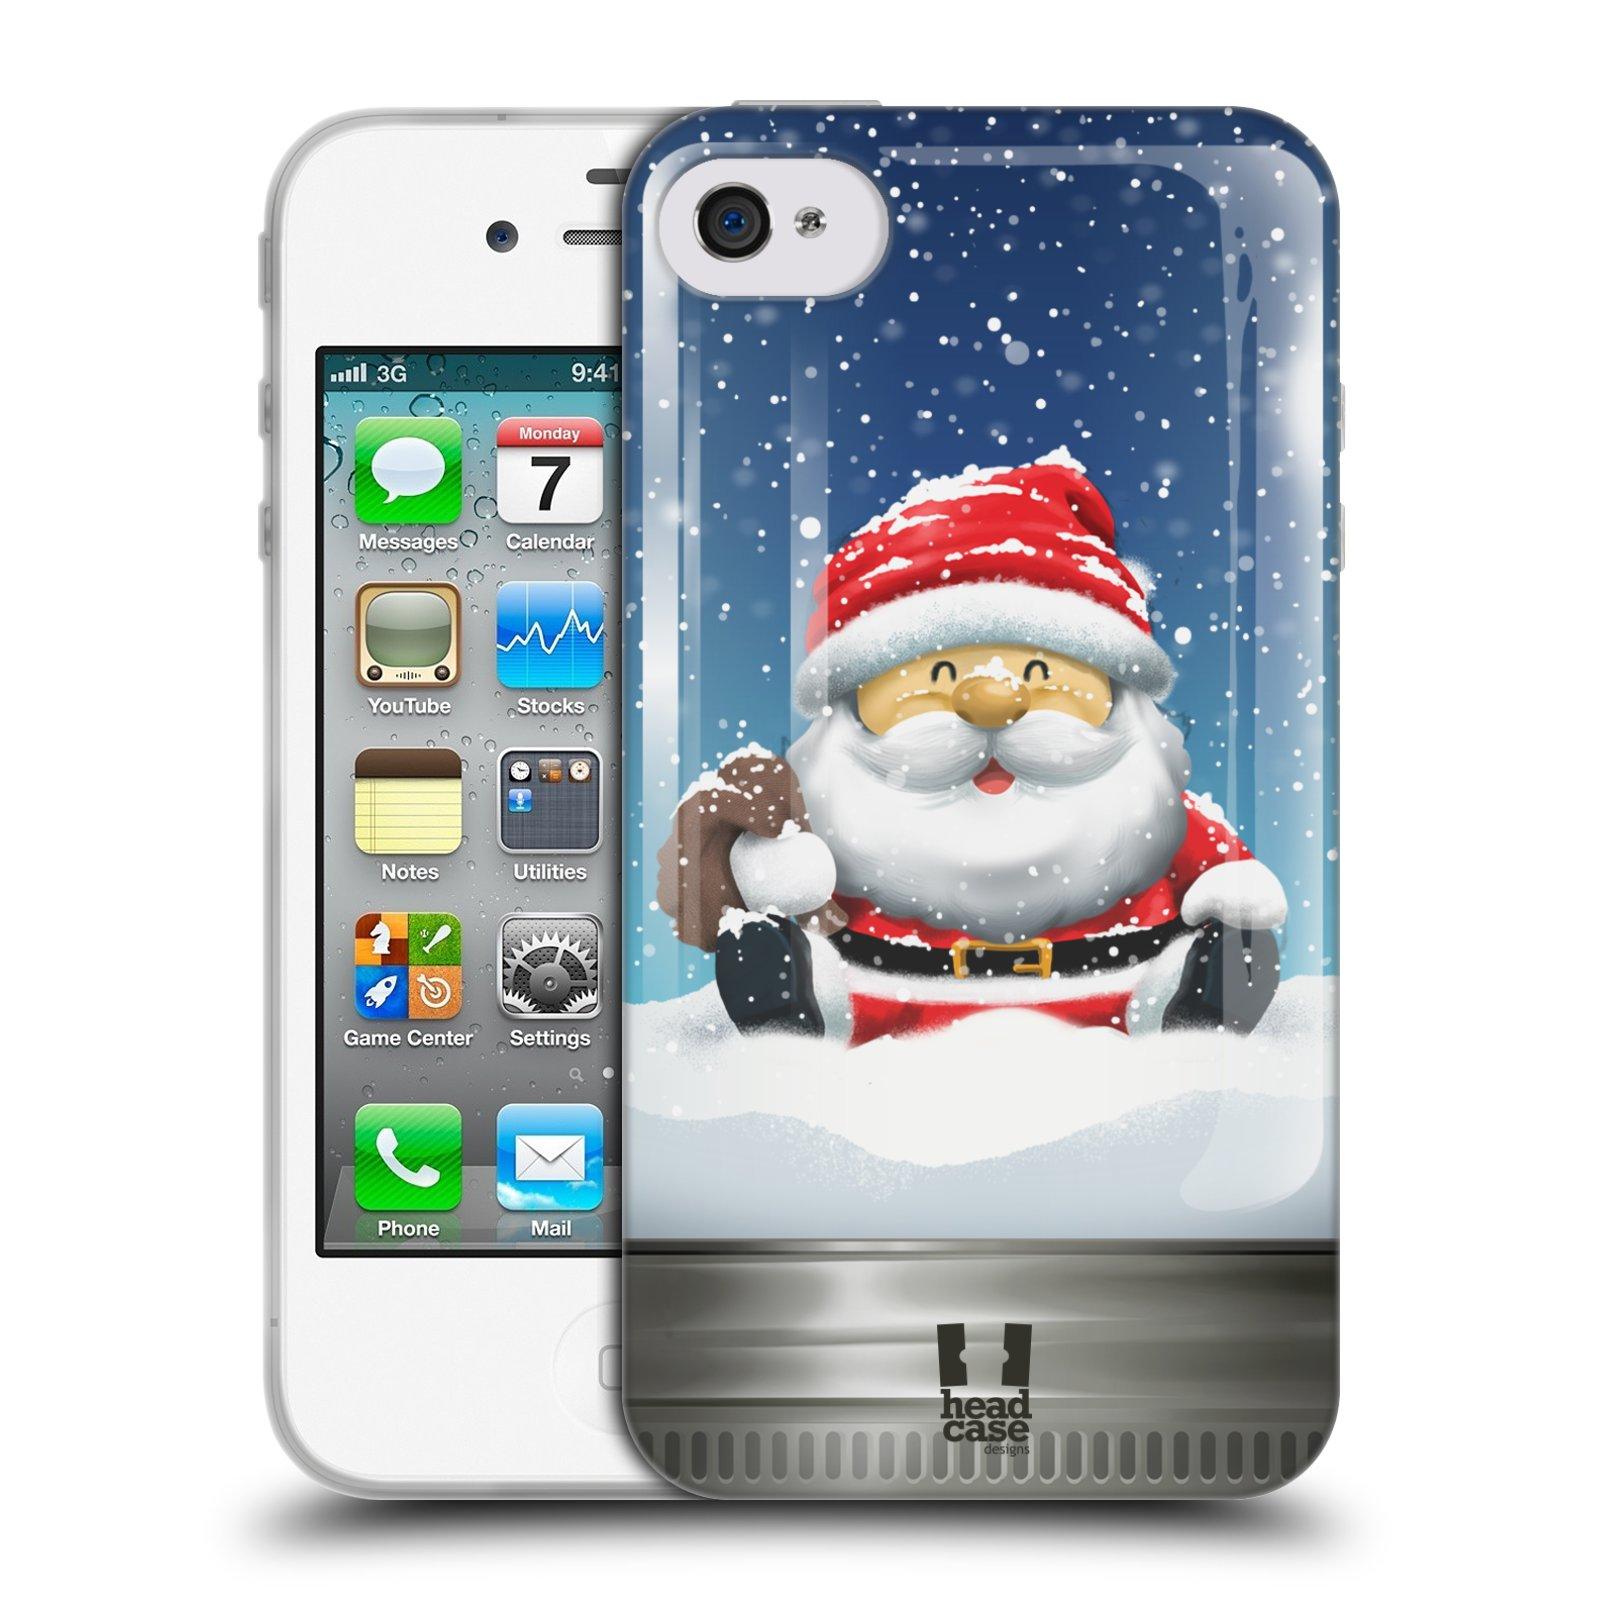 HEAD CASE silikonový obal na mobil Apple Iphone 4/4S vzor Vánoce v těžítku SANTA